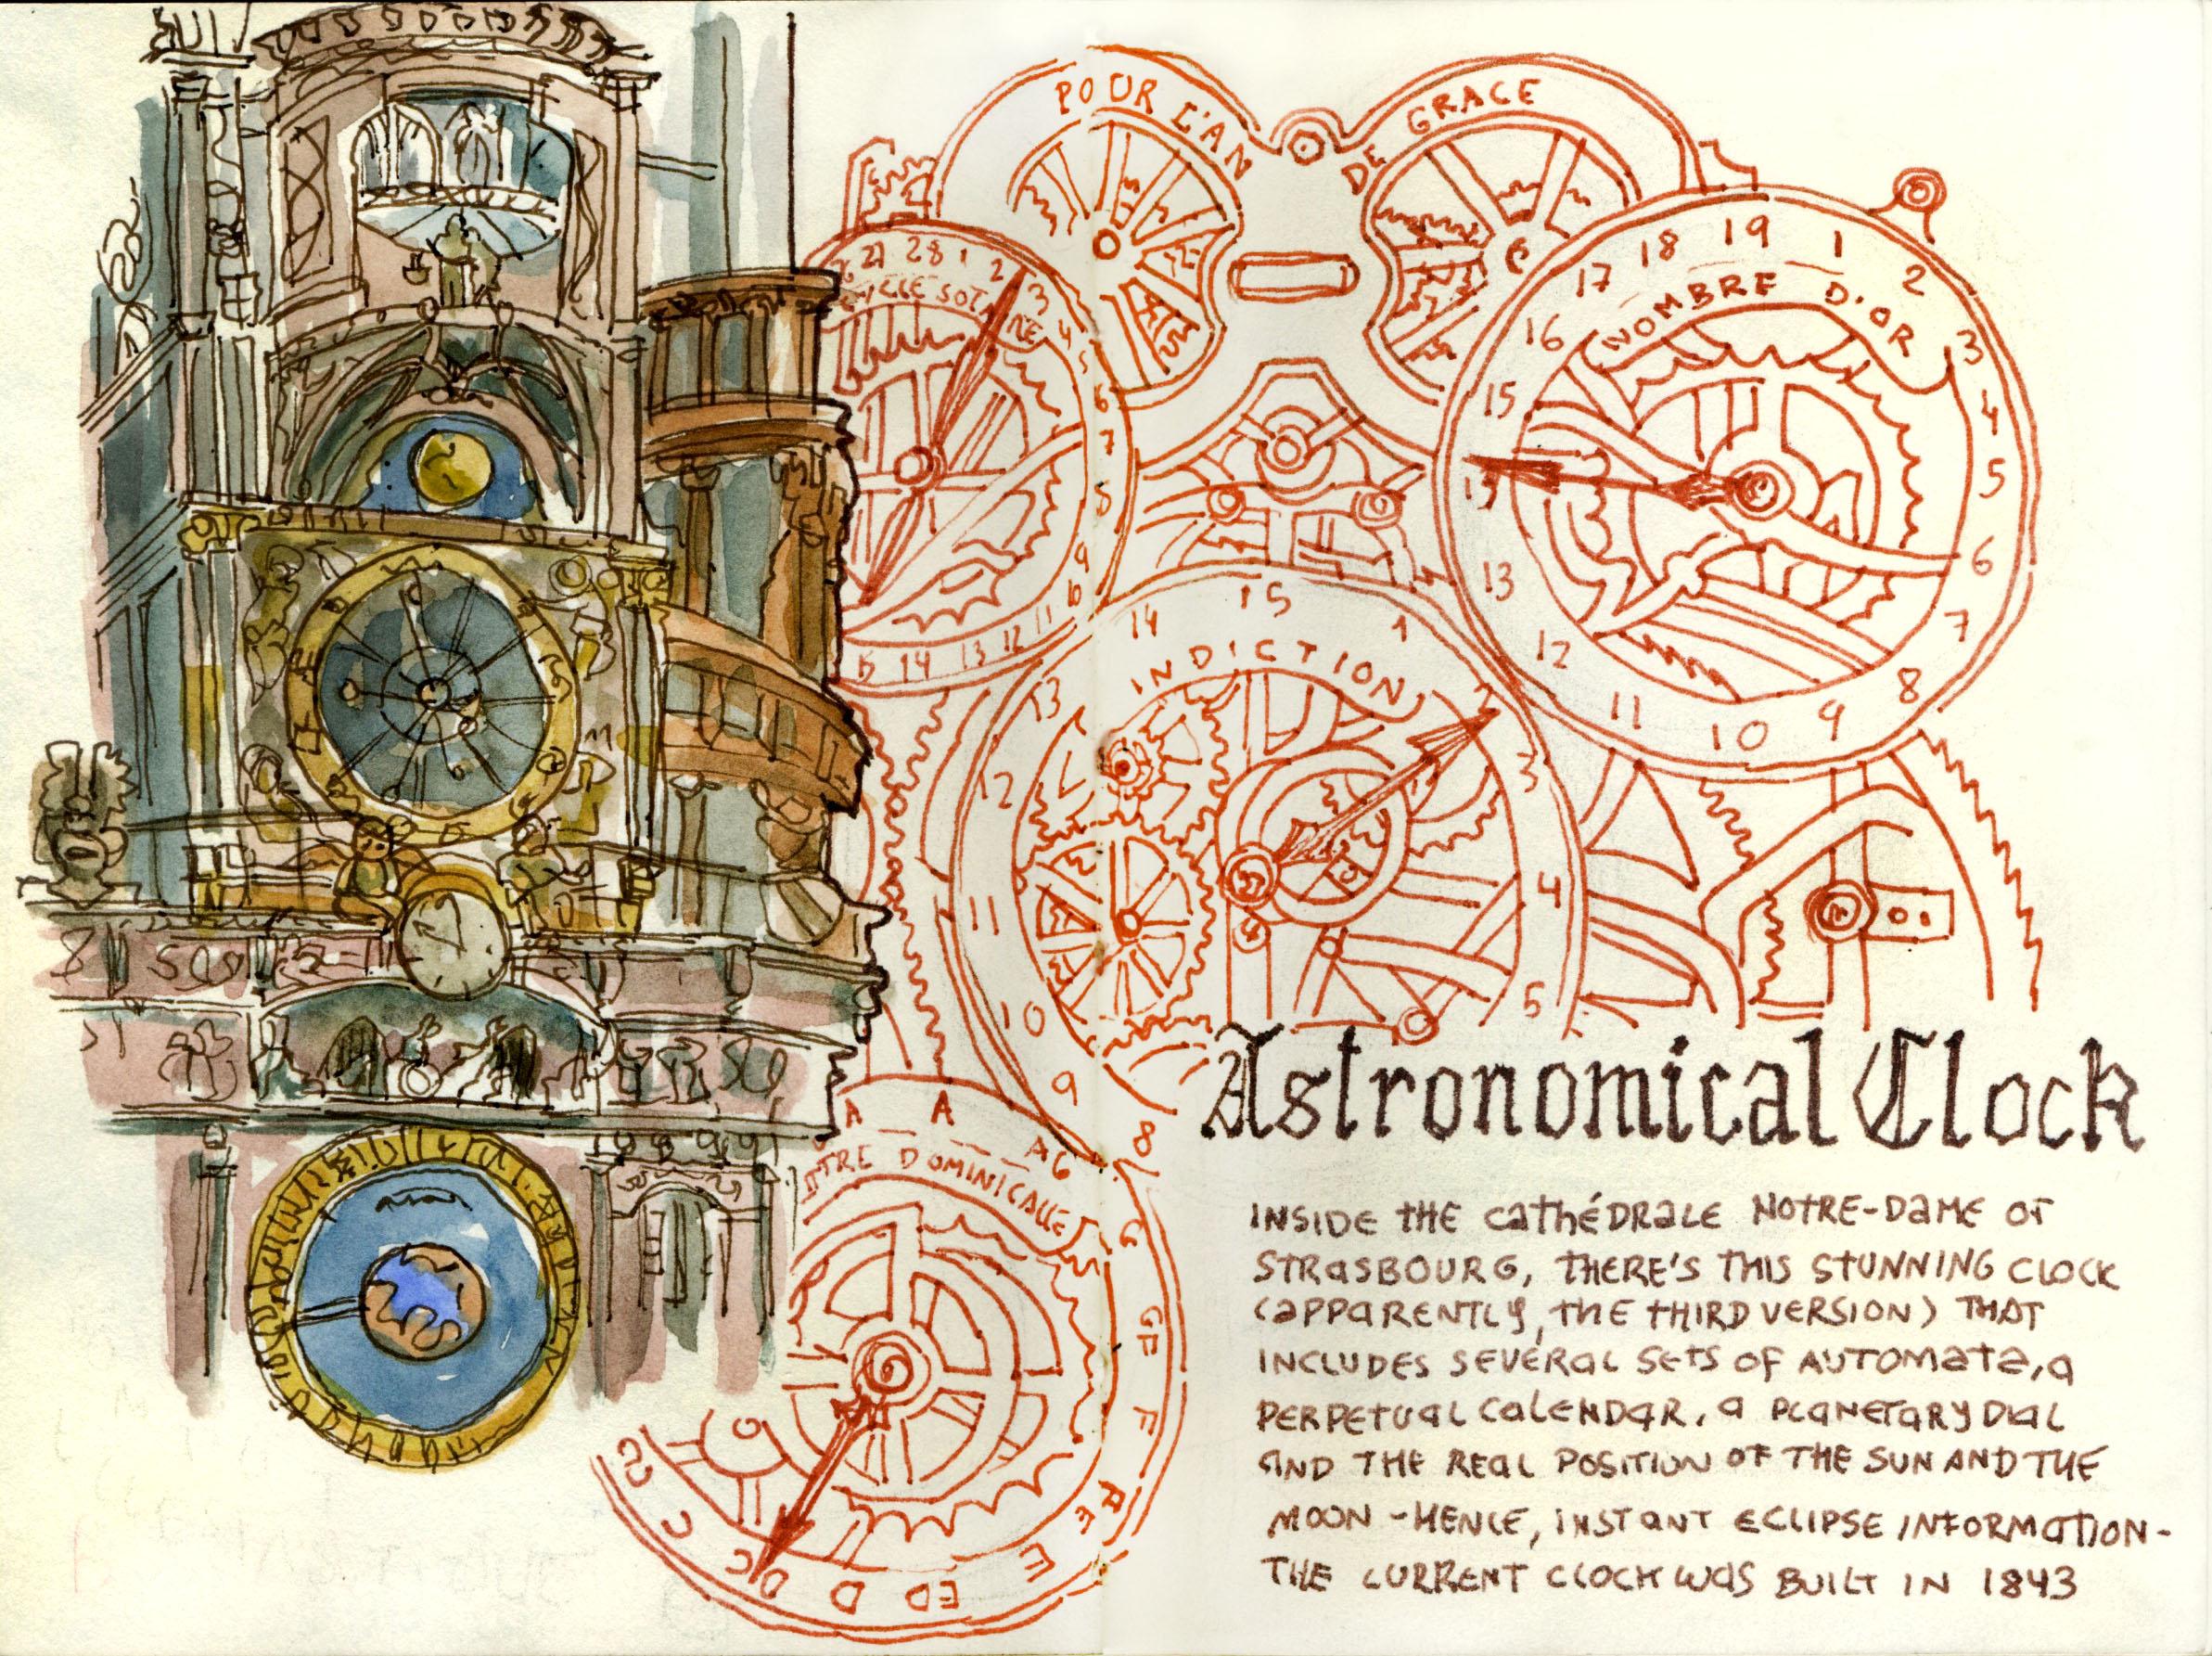 <b>The Strasbourg Astronomical Clock</b>